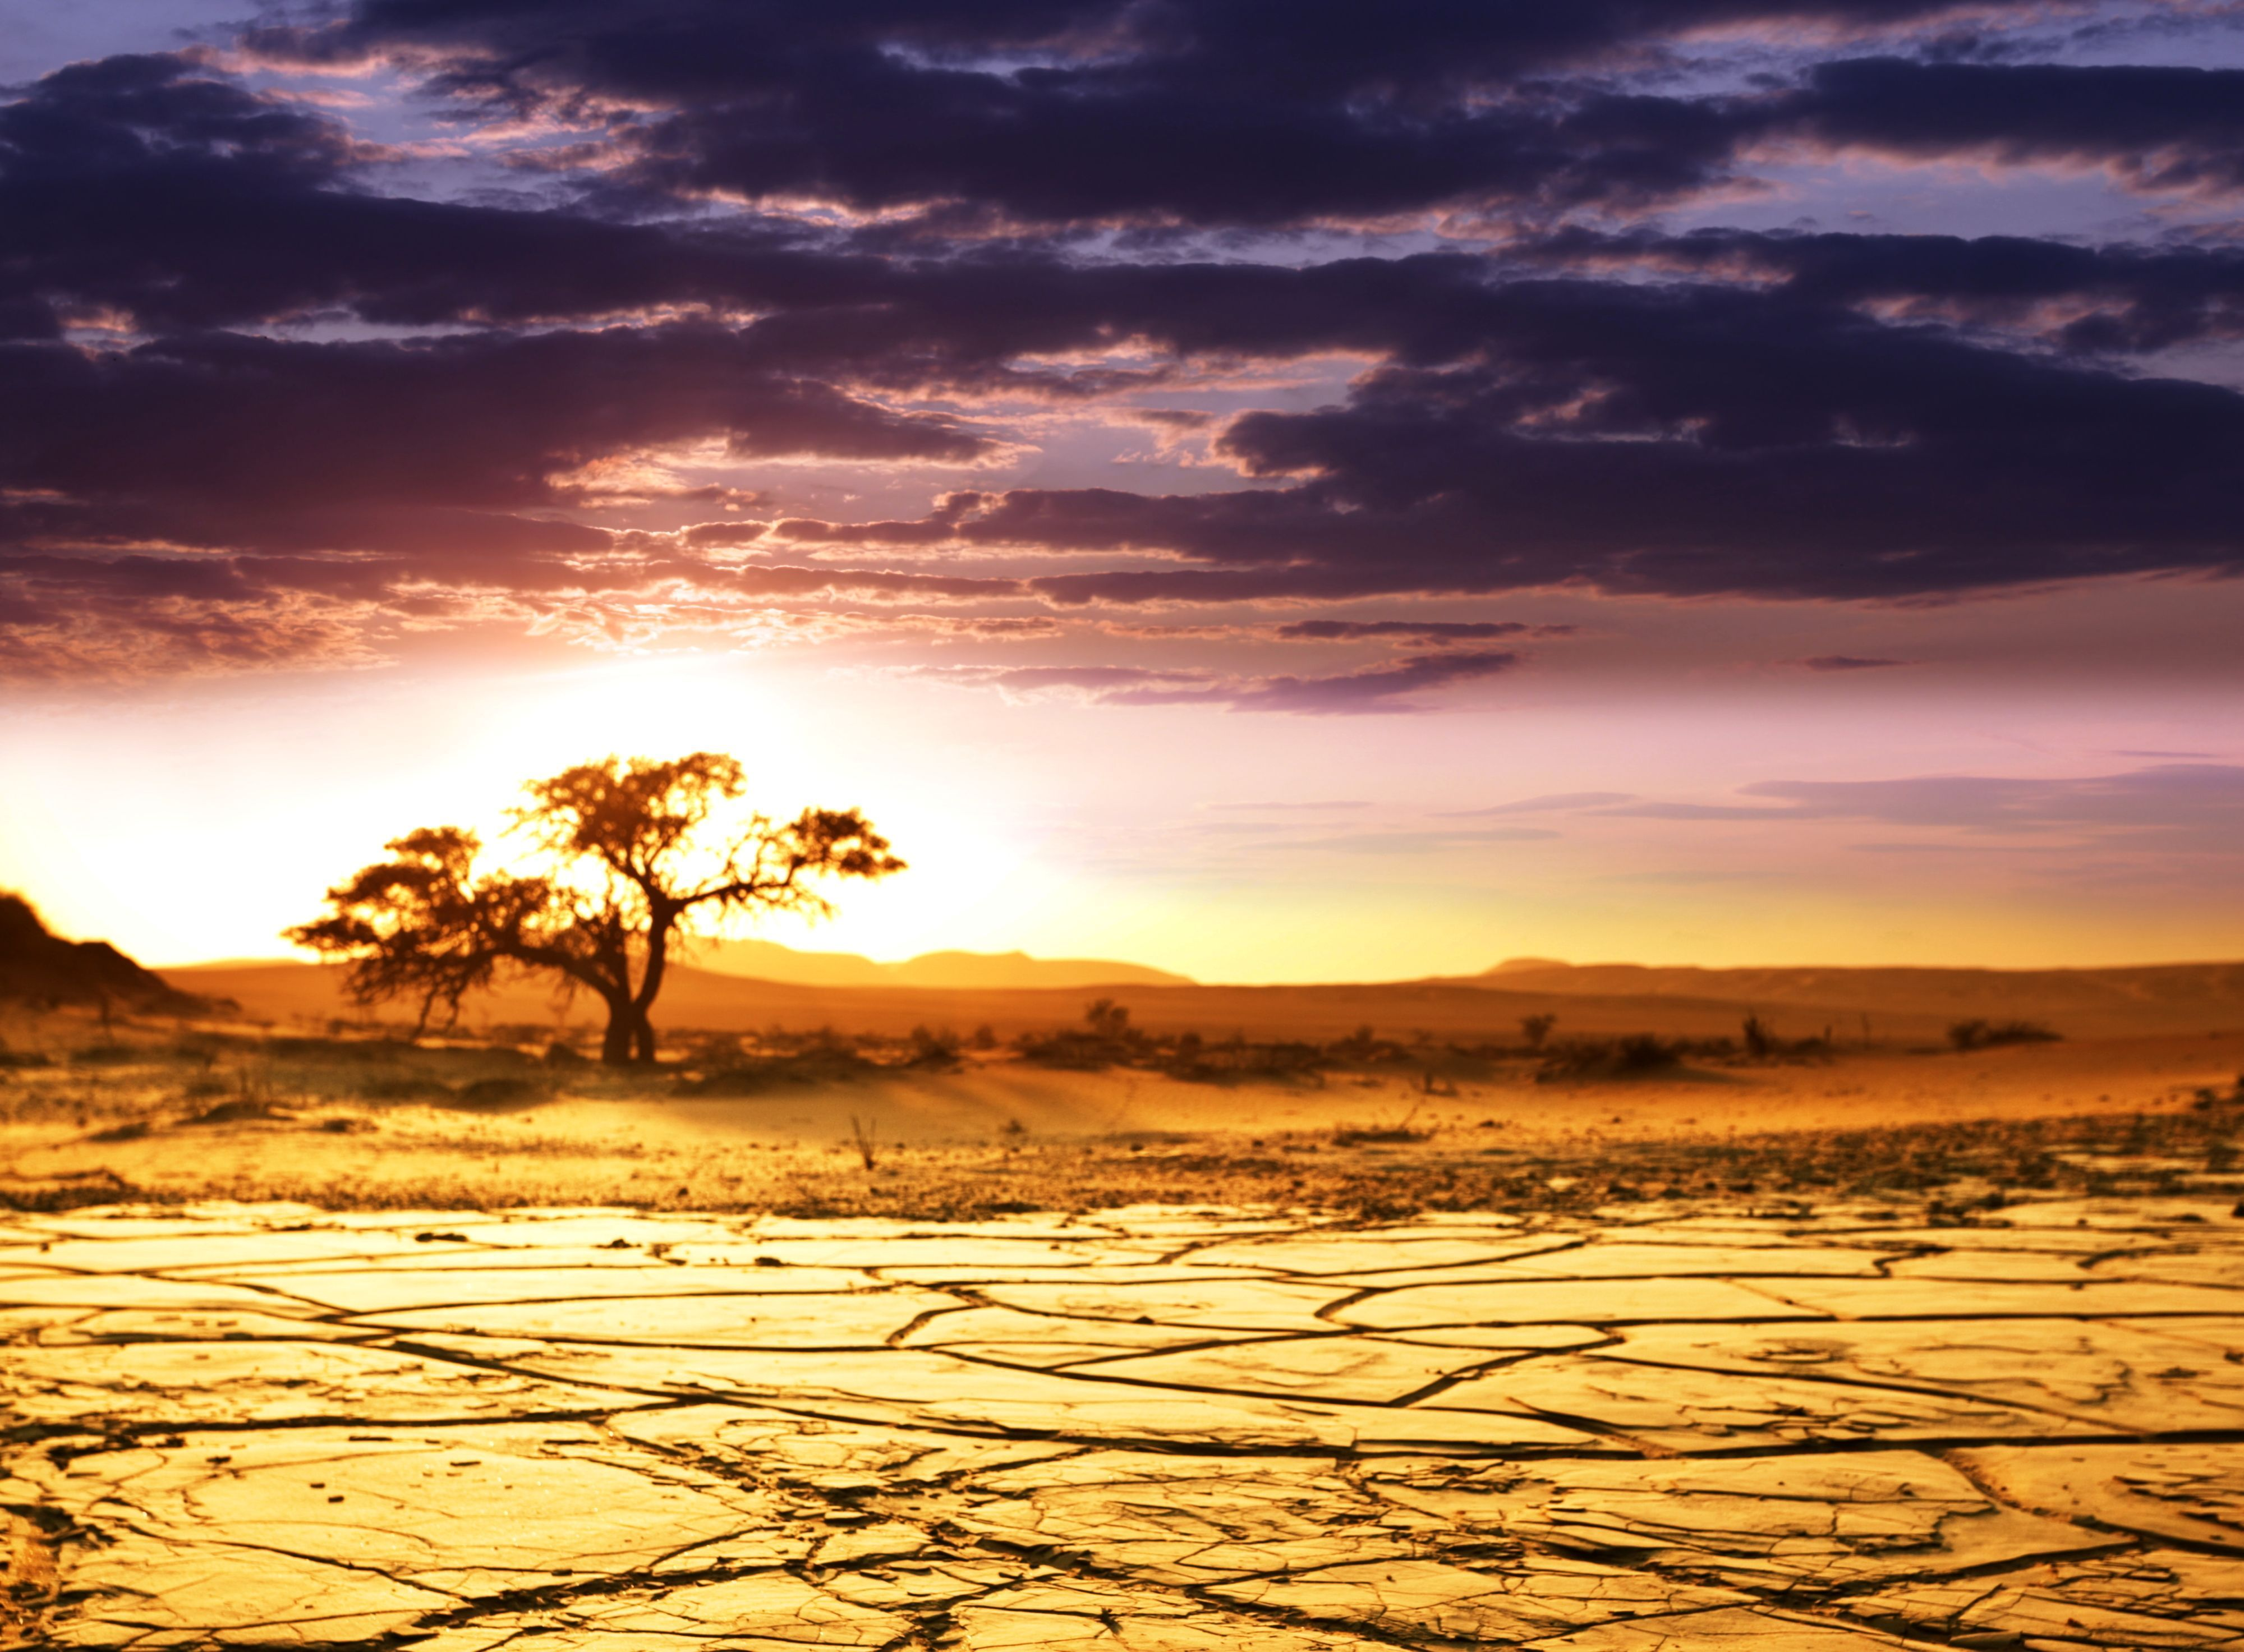 Download wallpaper Africa, savannah, landscape, horizon